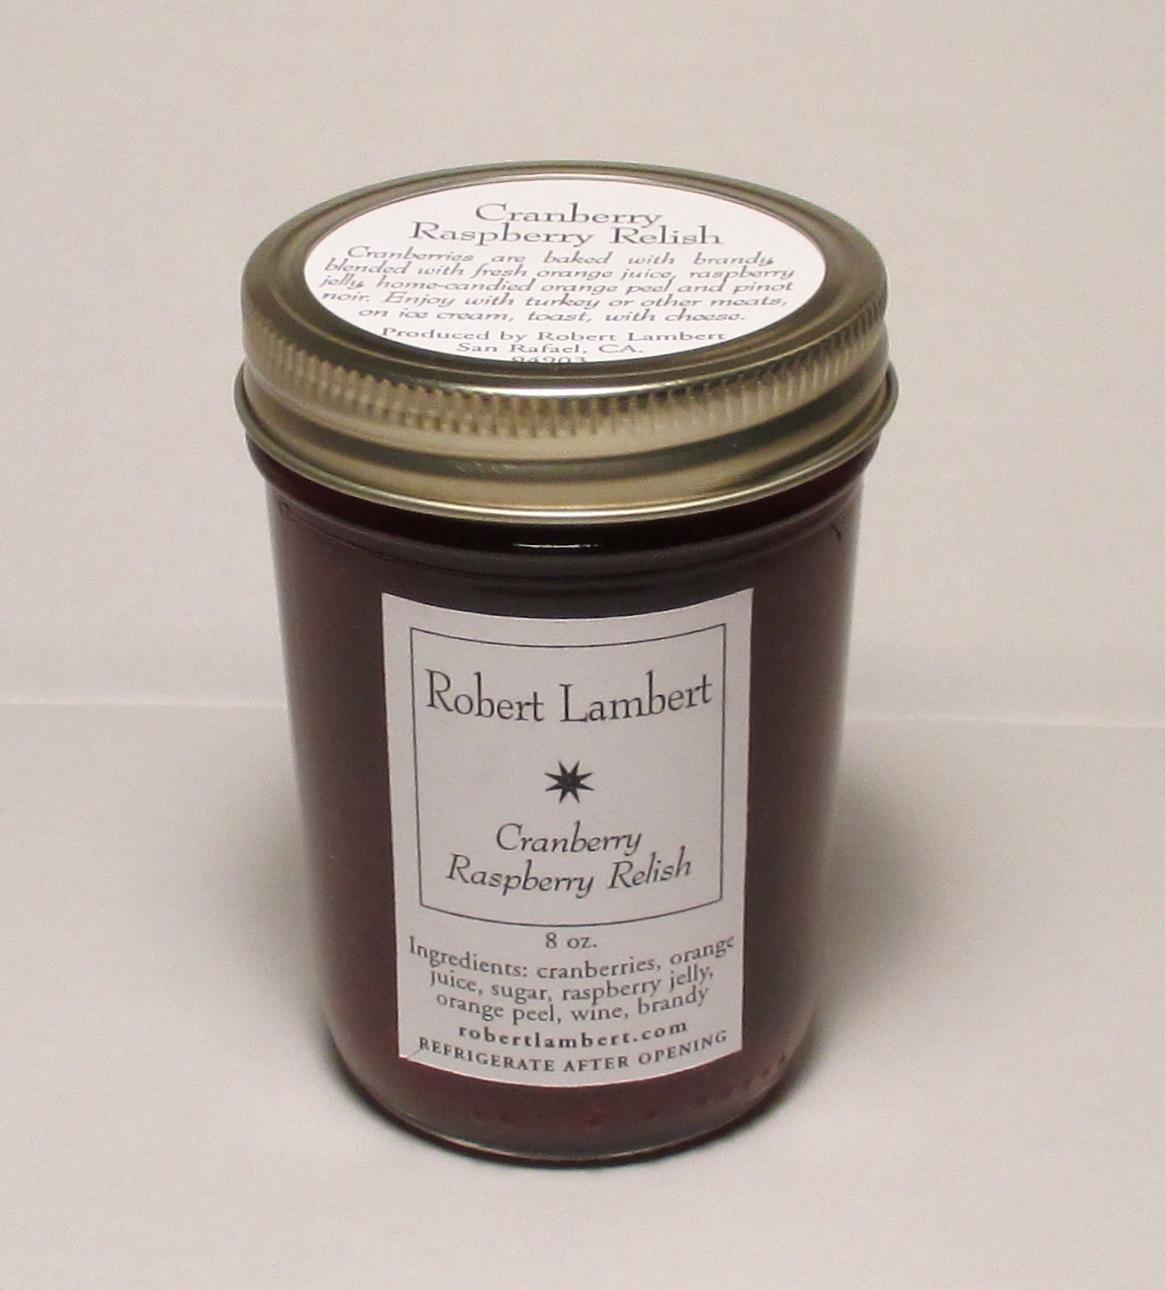 RL-Cranberry-Raspberry-Relish